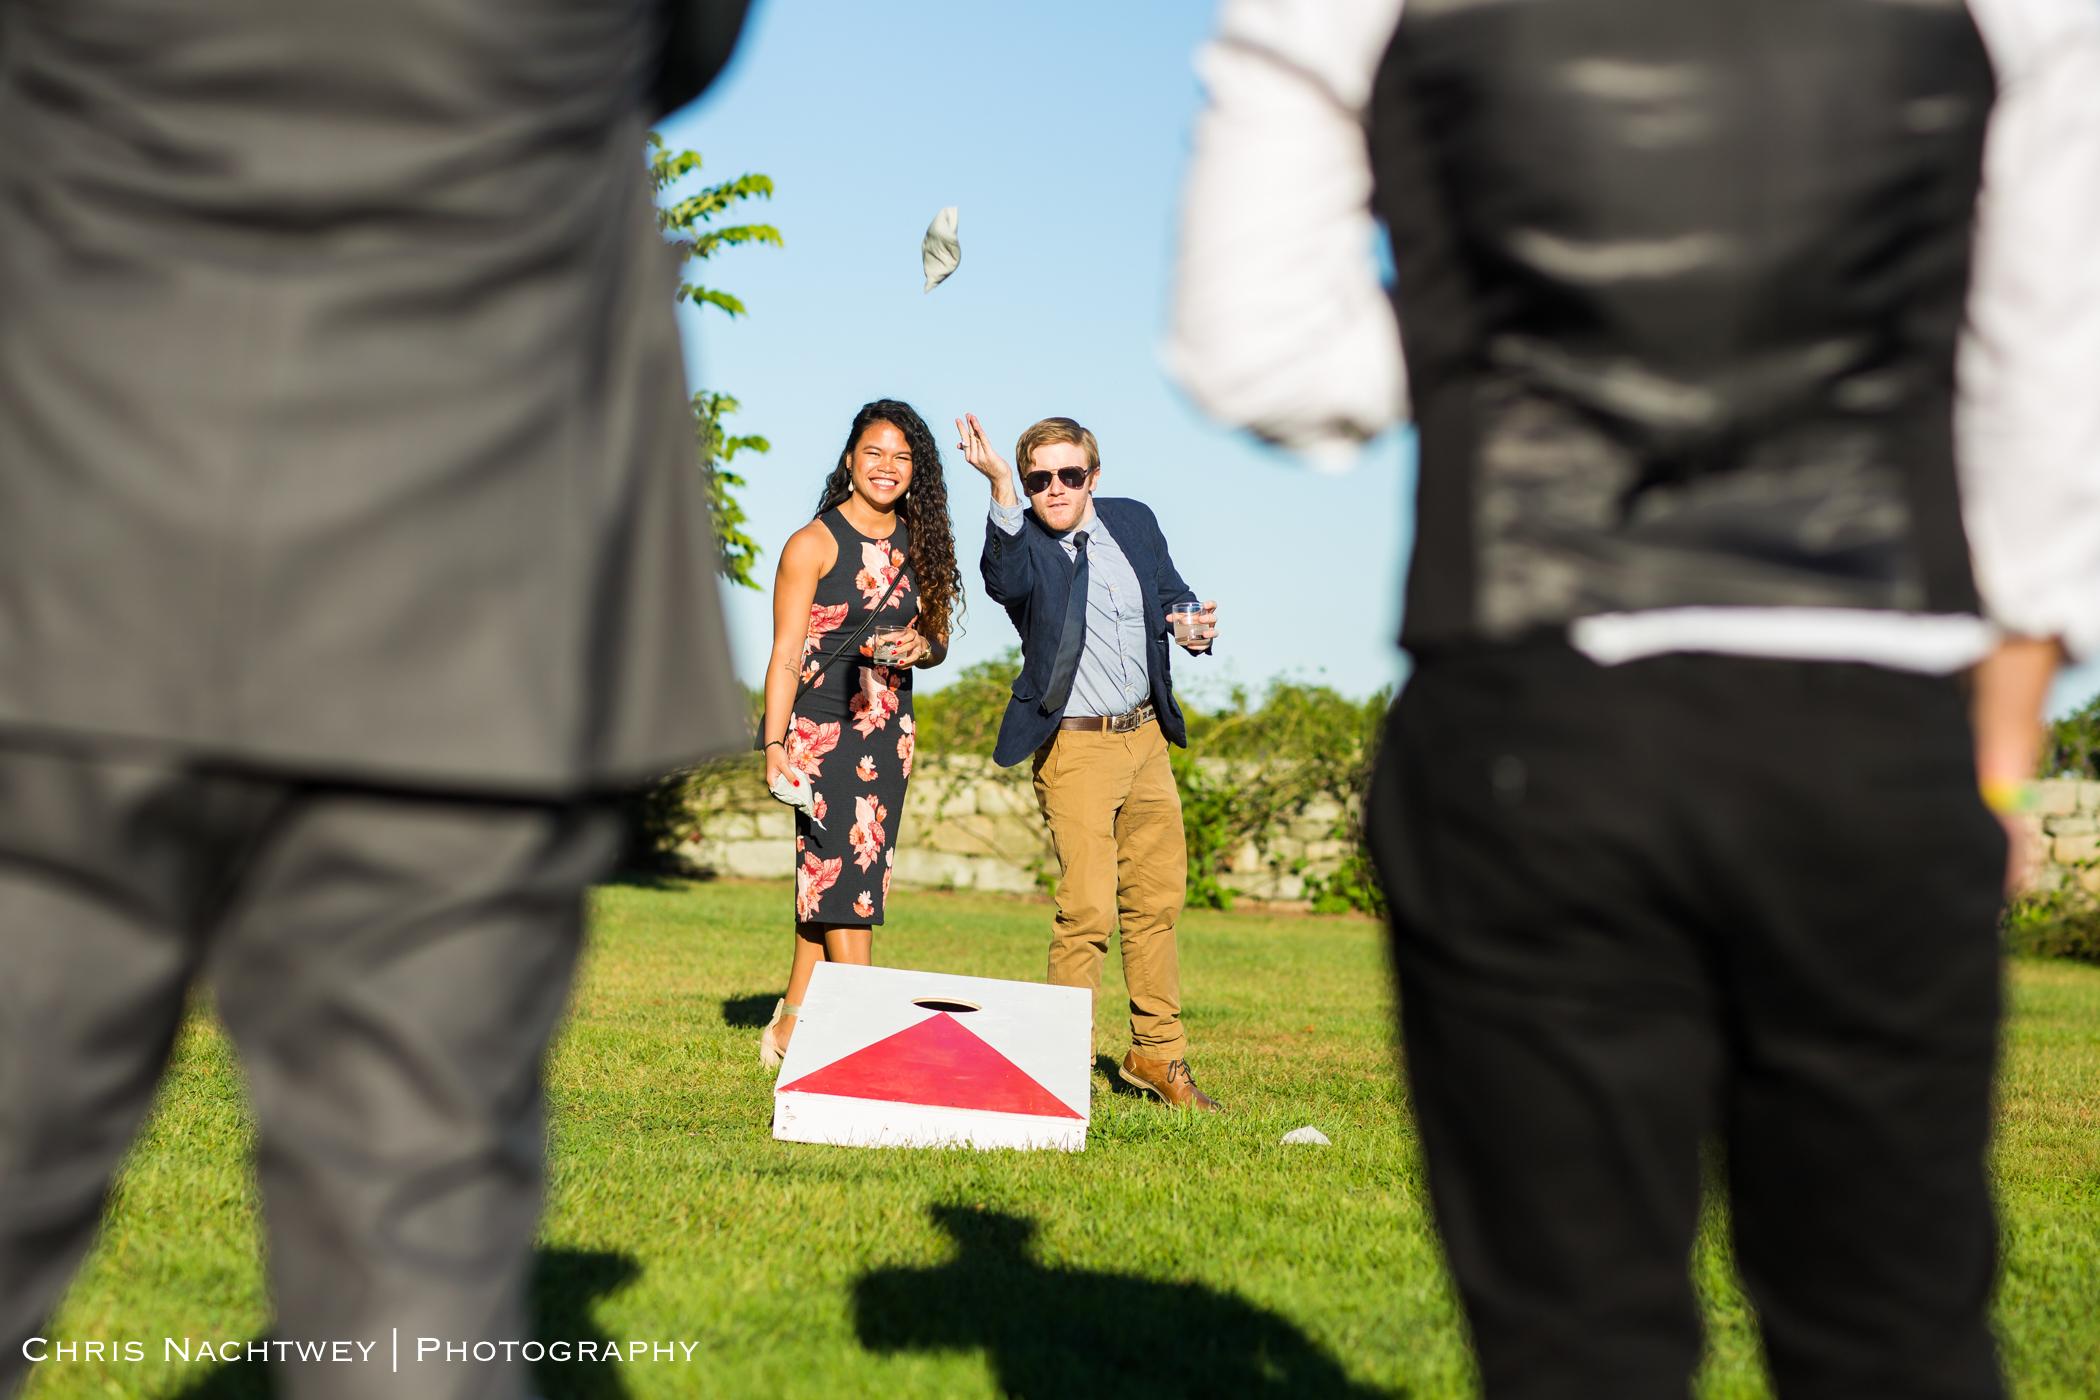 harkness-wedding-photos-chris-nachtwey-photography-2018-19.jpg